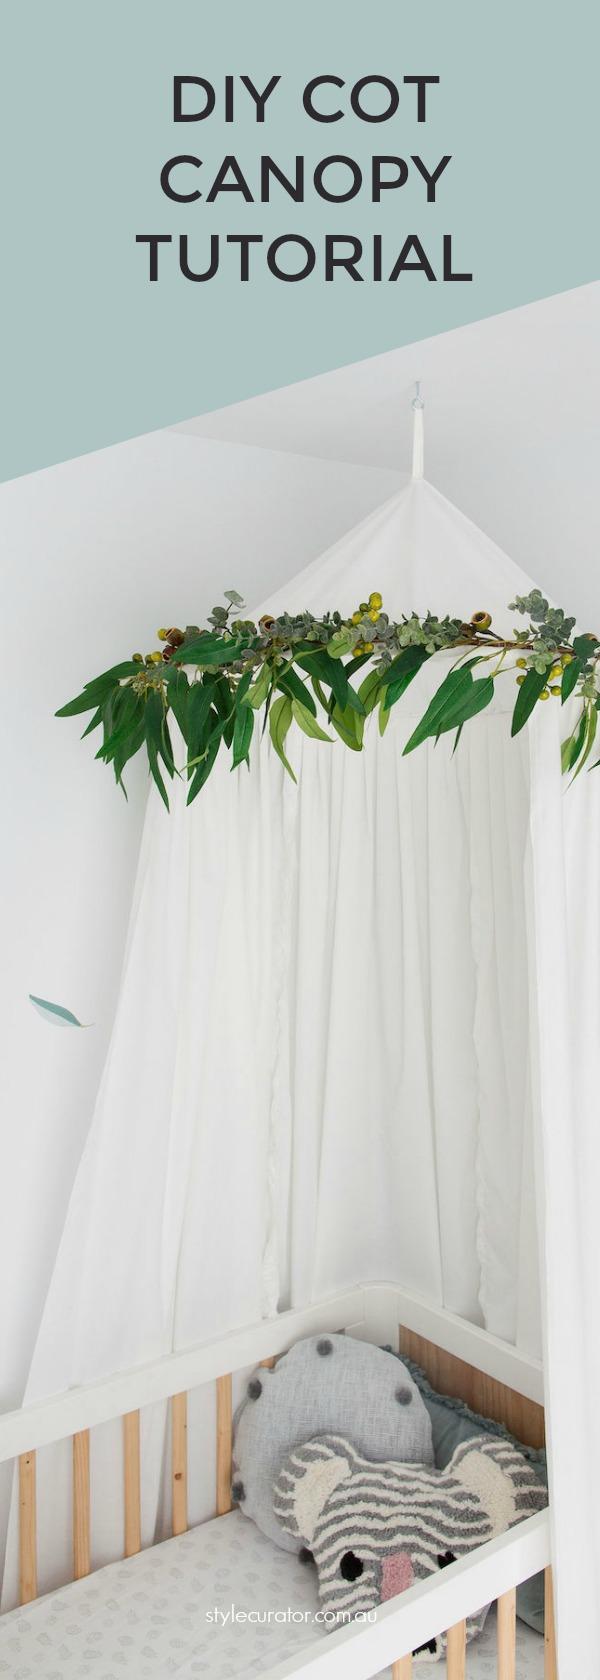 Cot canopy pinterest